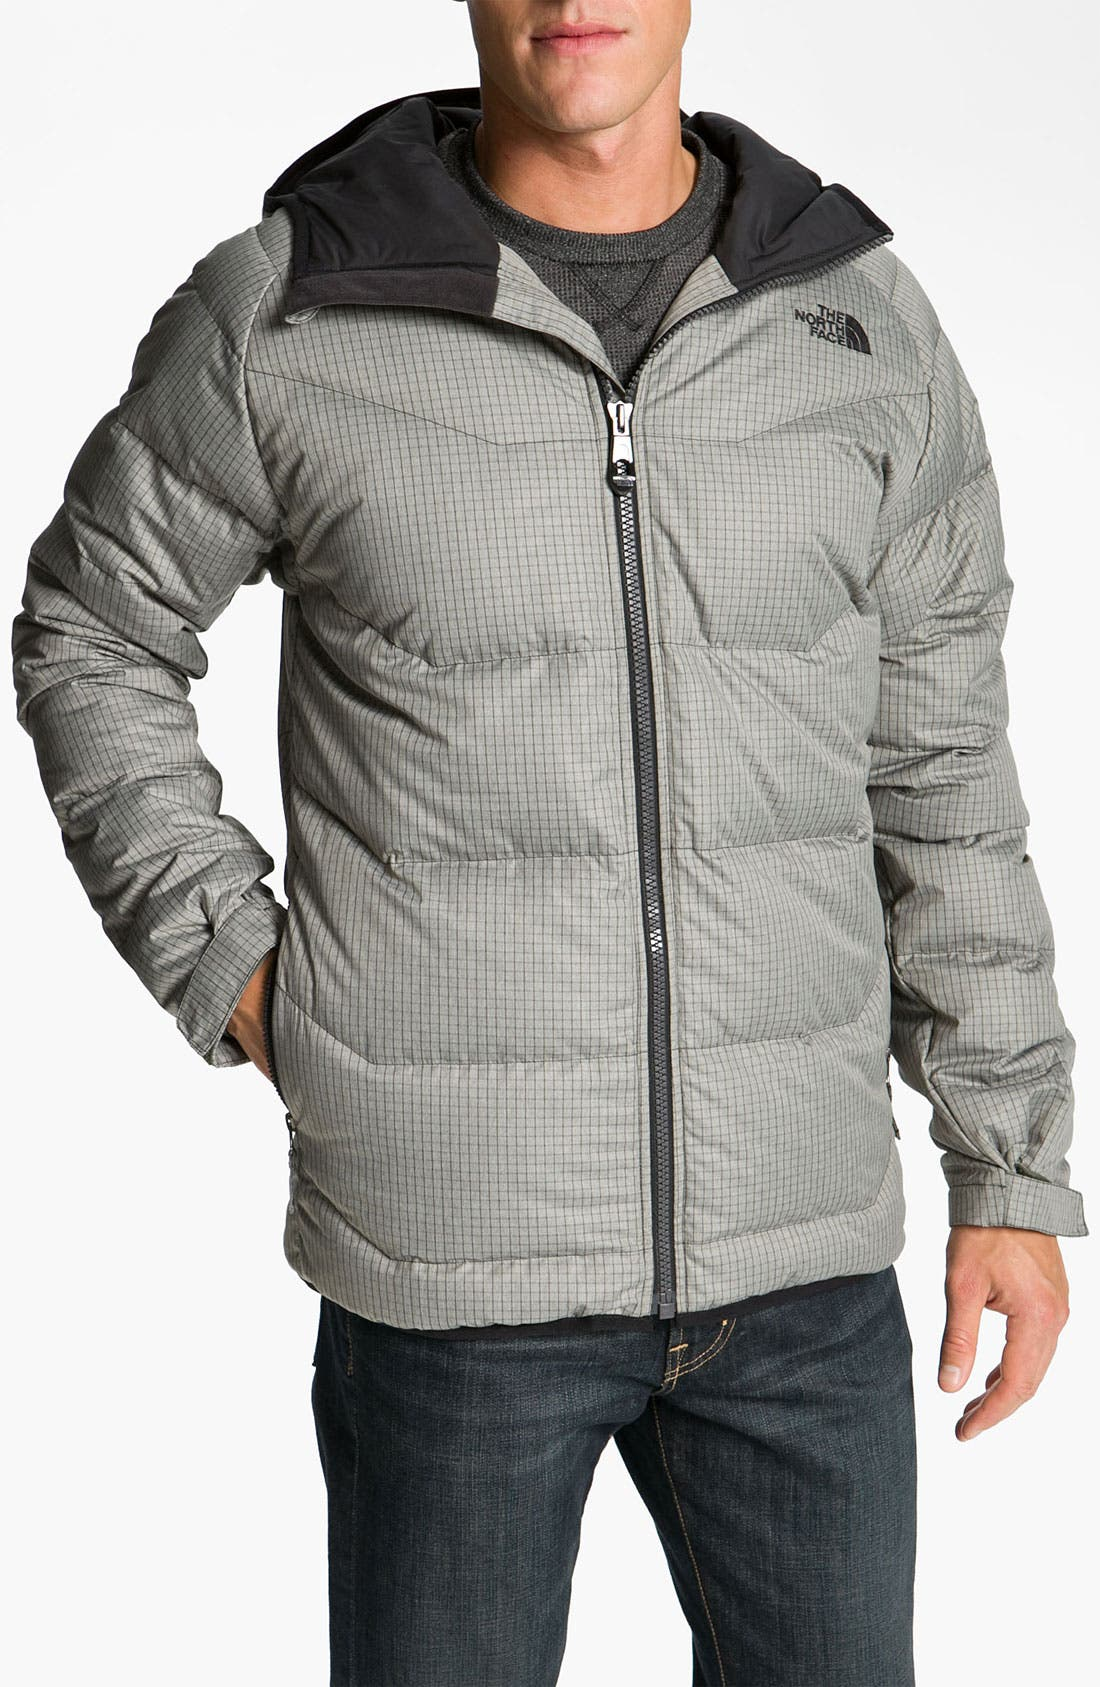 Main Image - The North Face 'Landover' Down Jacket